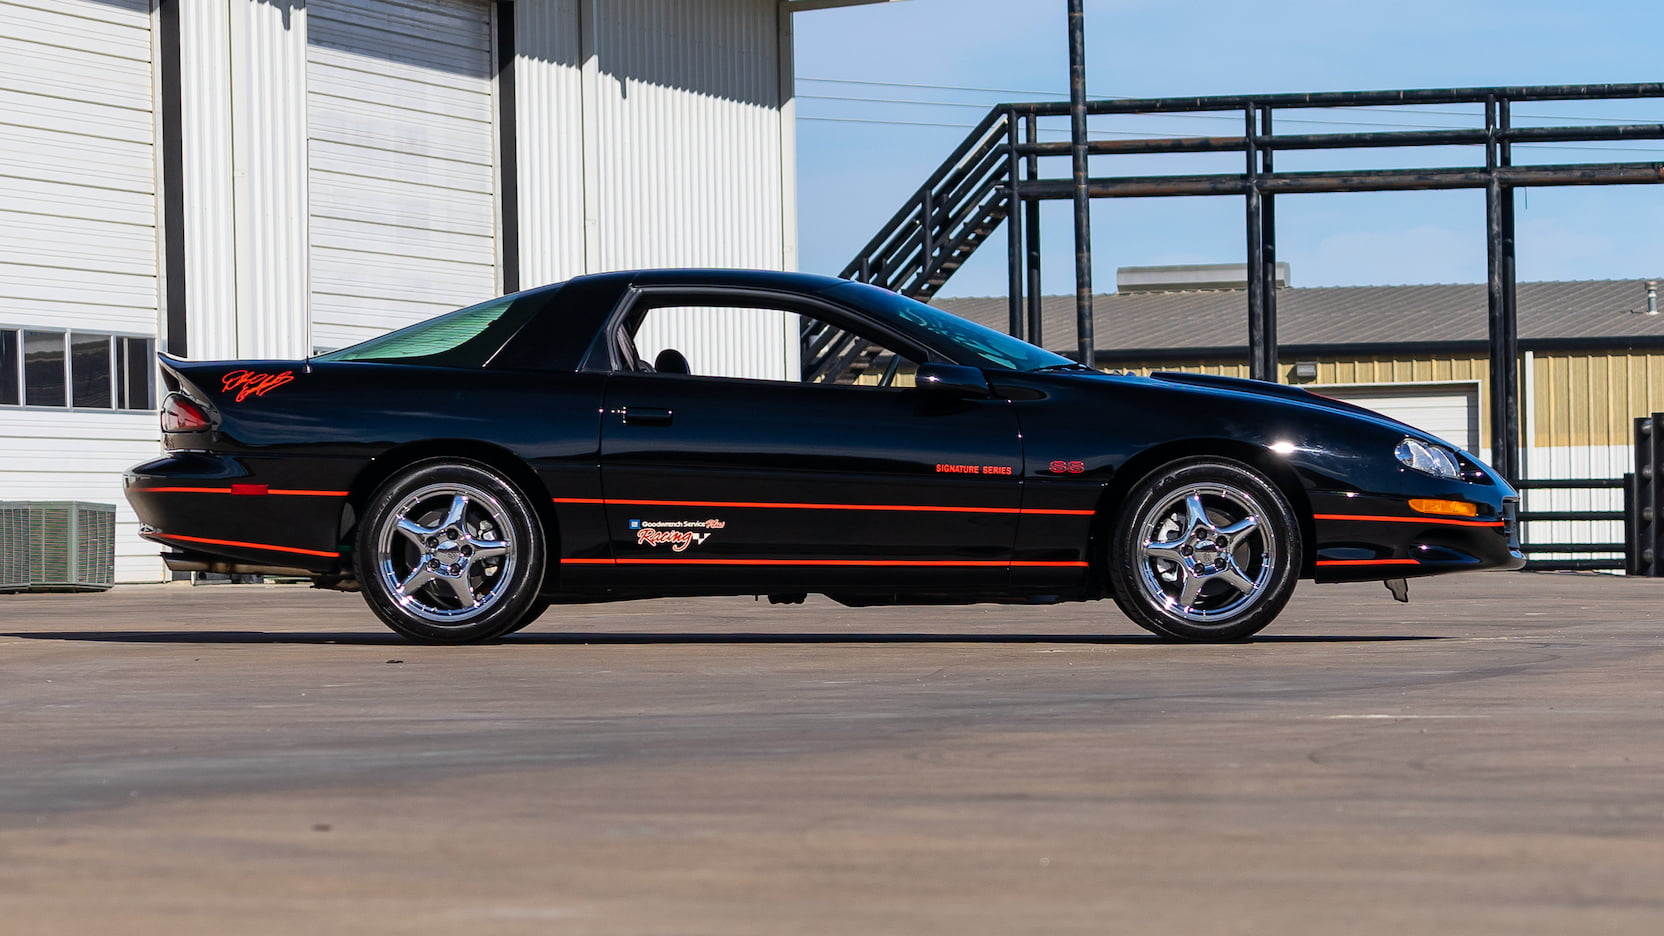 2000 Chevrolet Camaro SS Earnhardt Edition